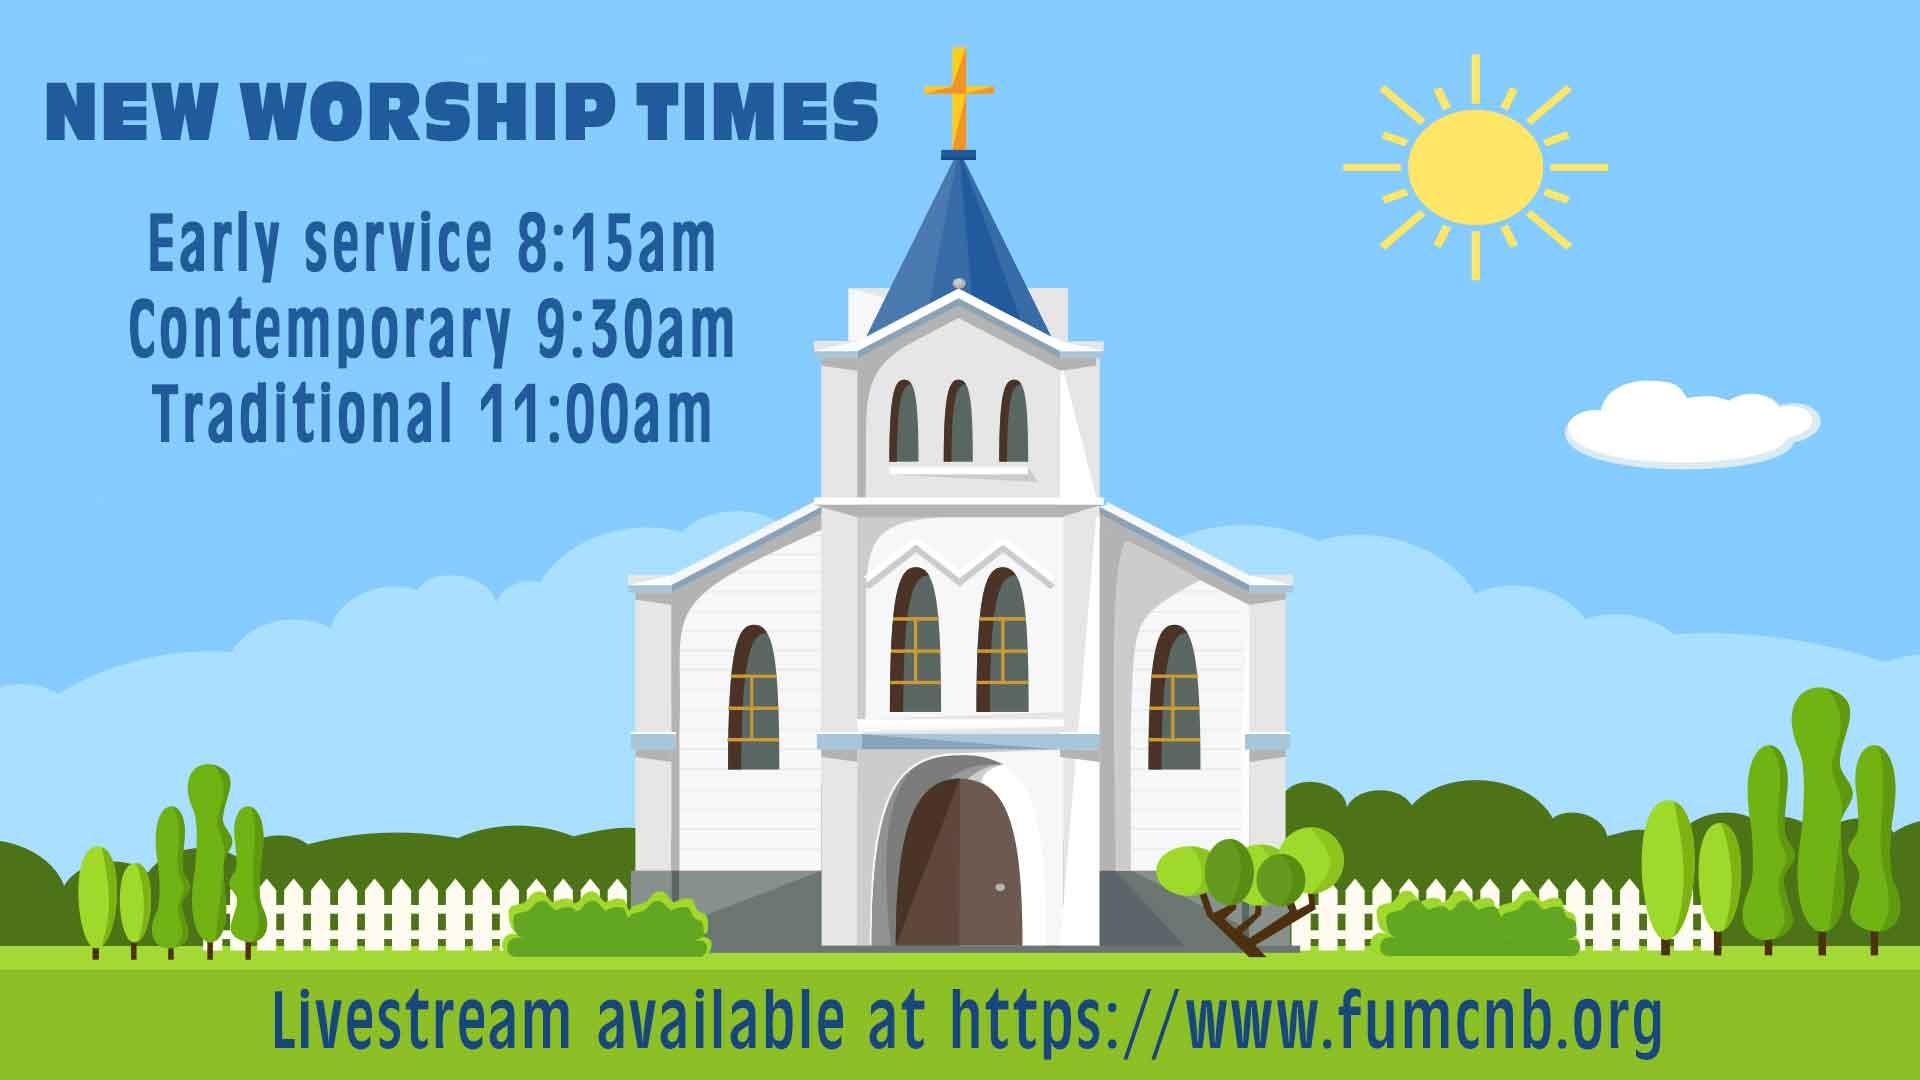 New Worship Times